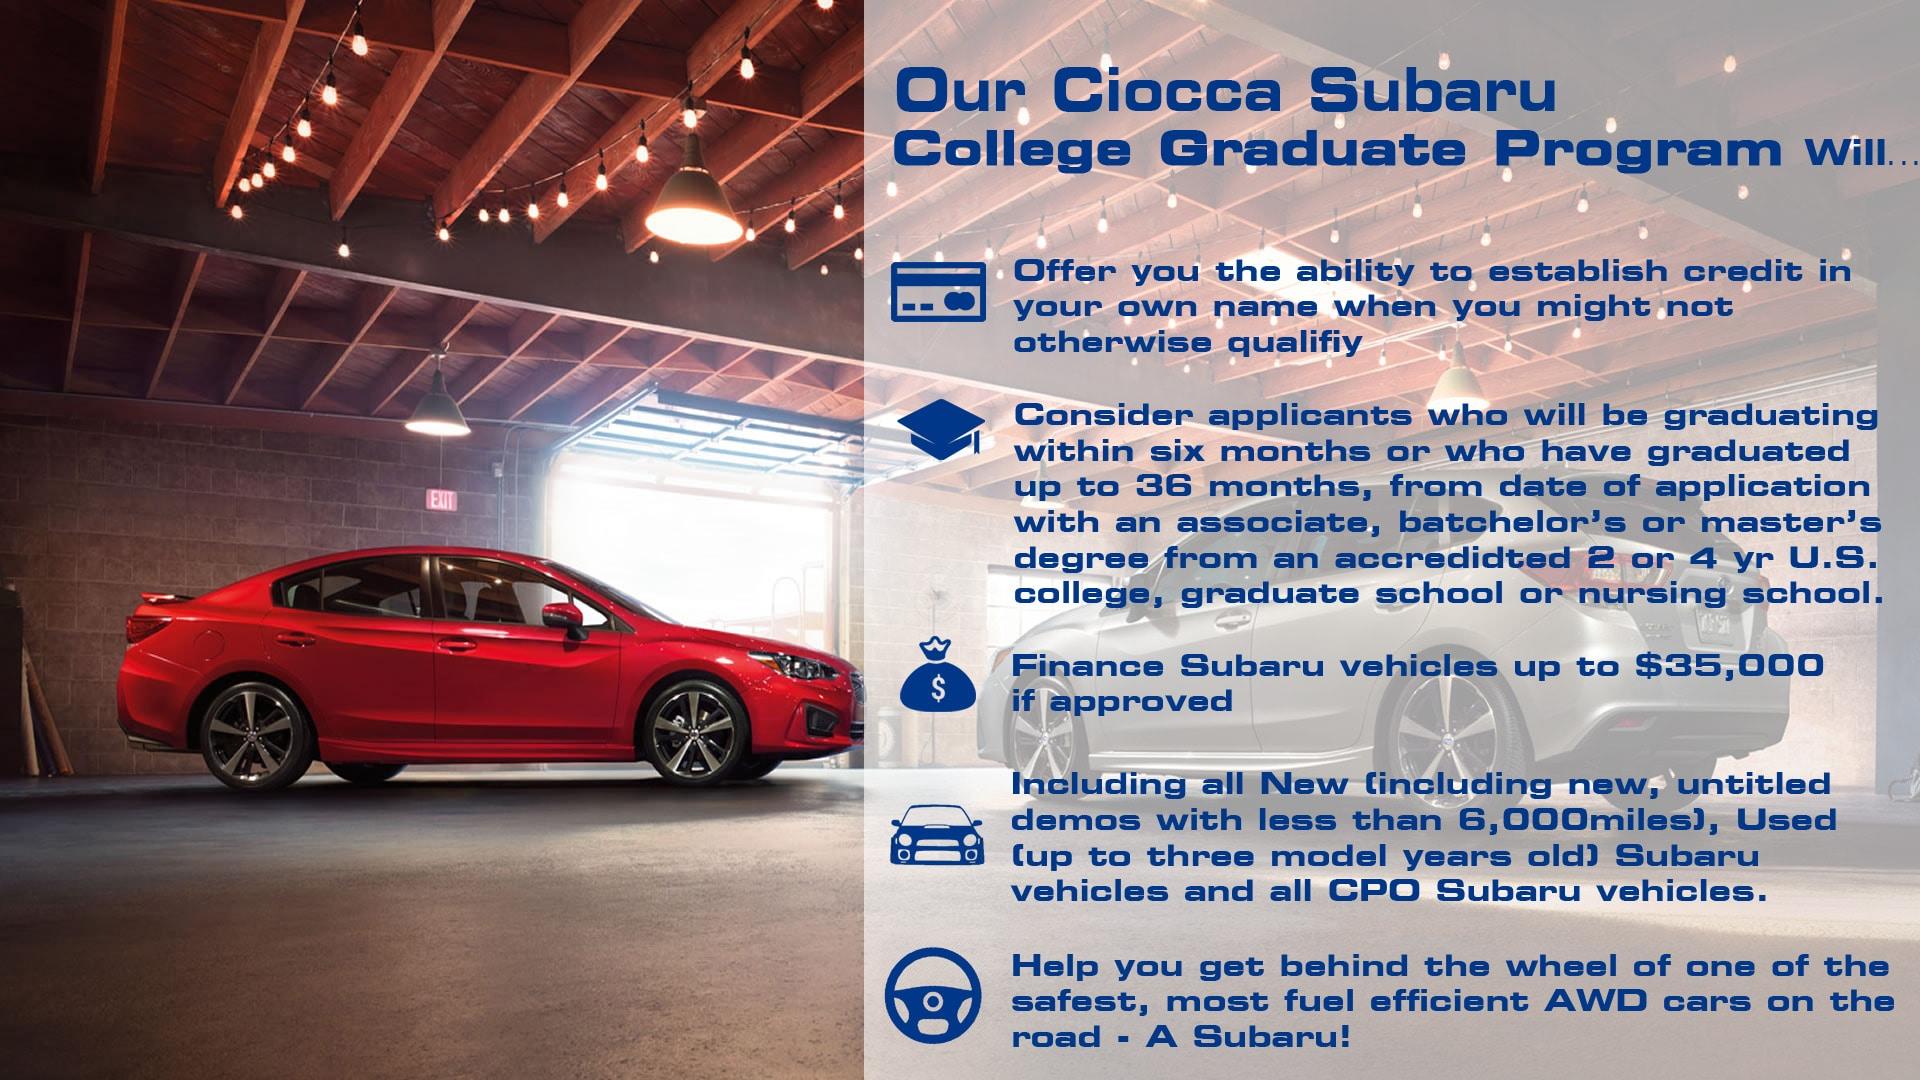 Ciocca Subaru New Subaru Dealership In Allentown PA - Subaru graduate program